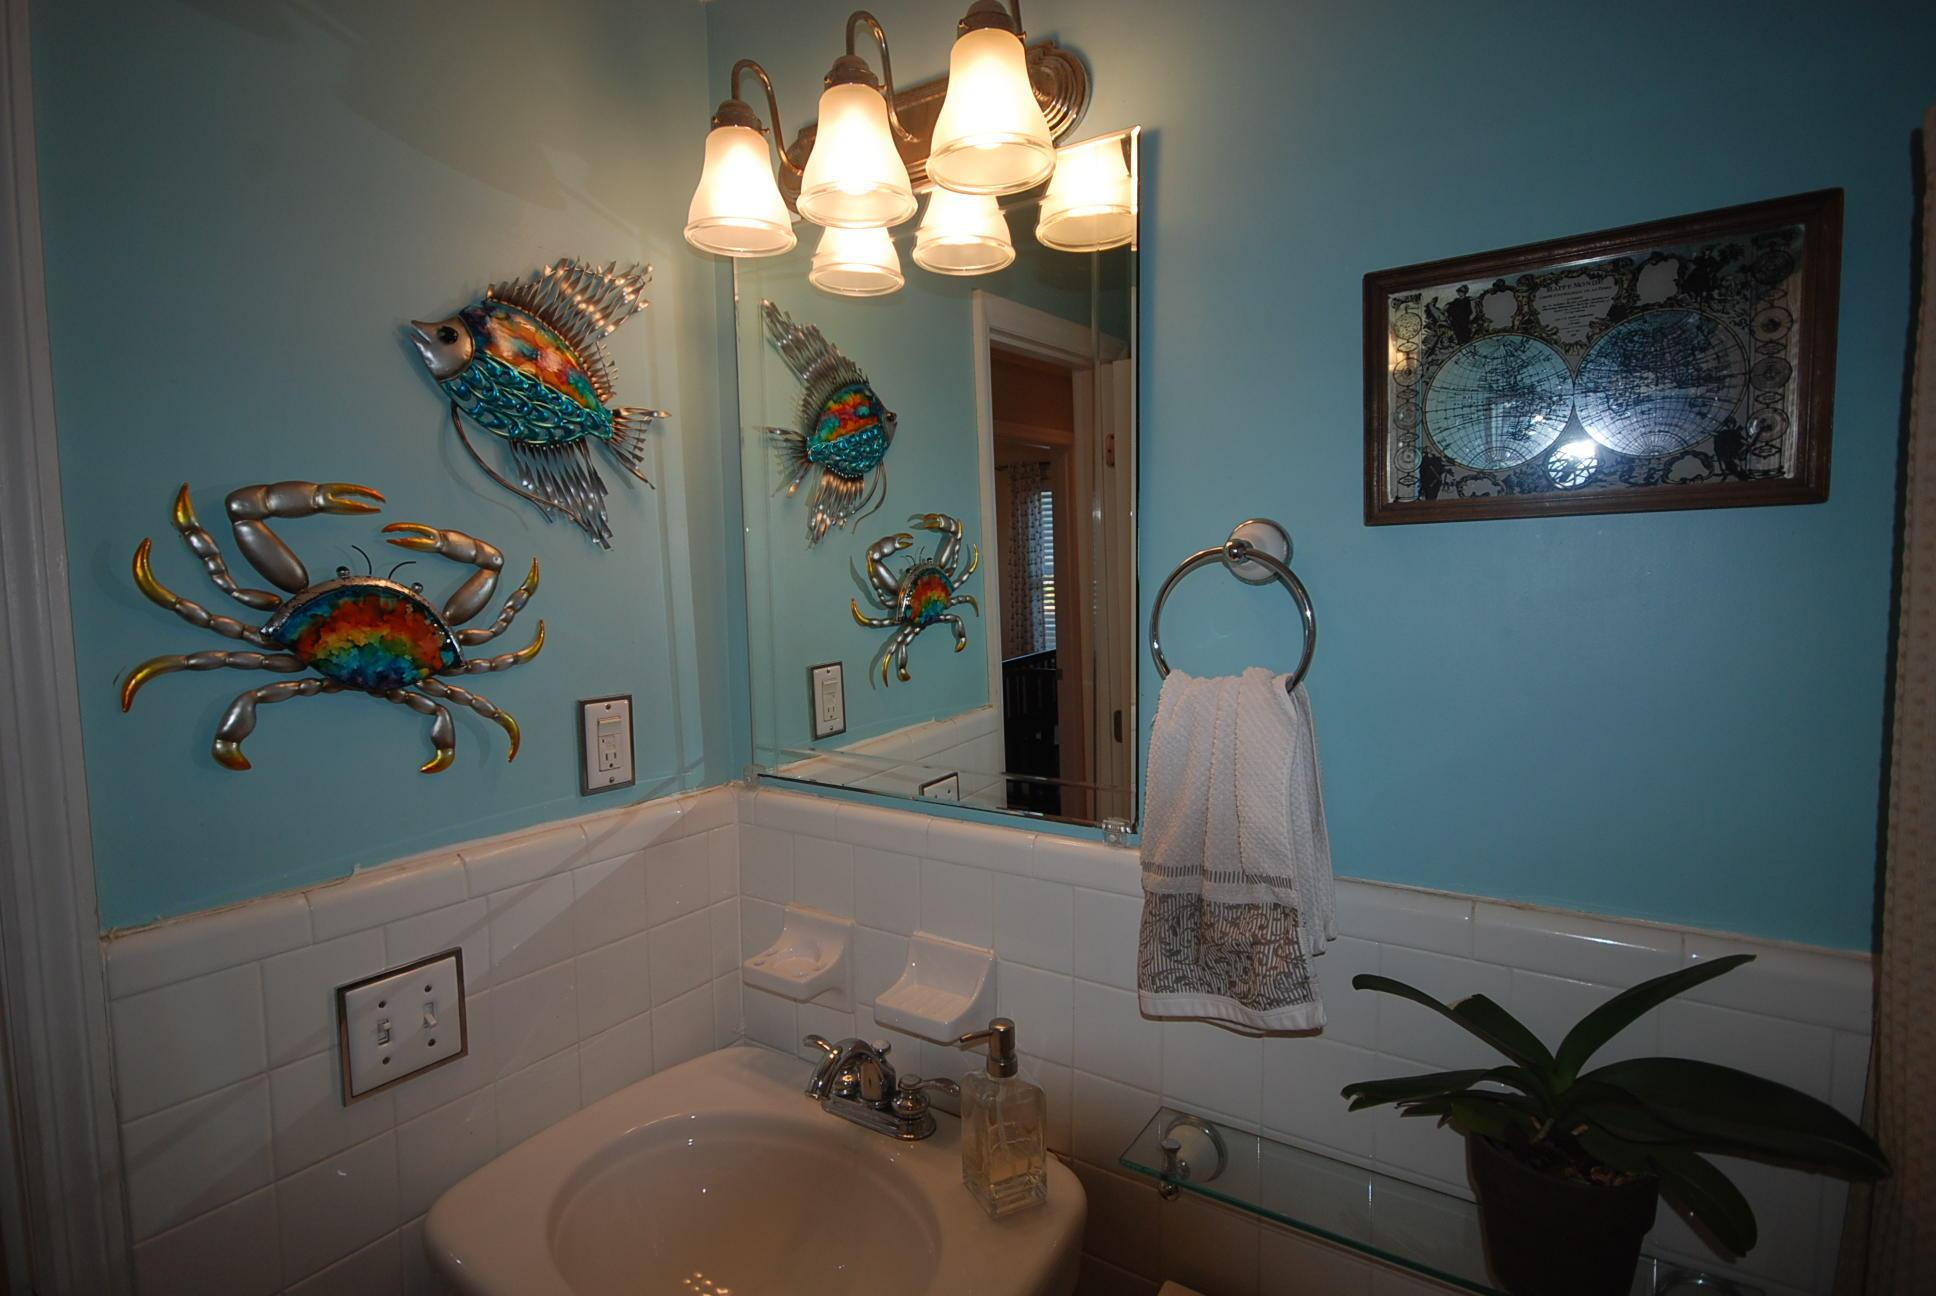 Capri Isles Homes For Sale - 213 Wappoo, Charleston, SC - 8